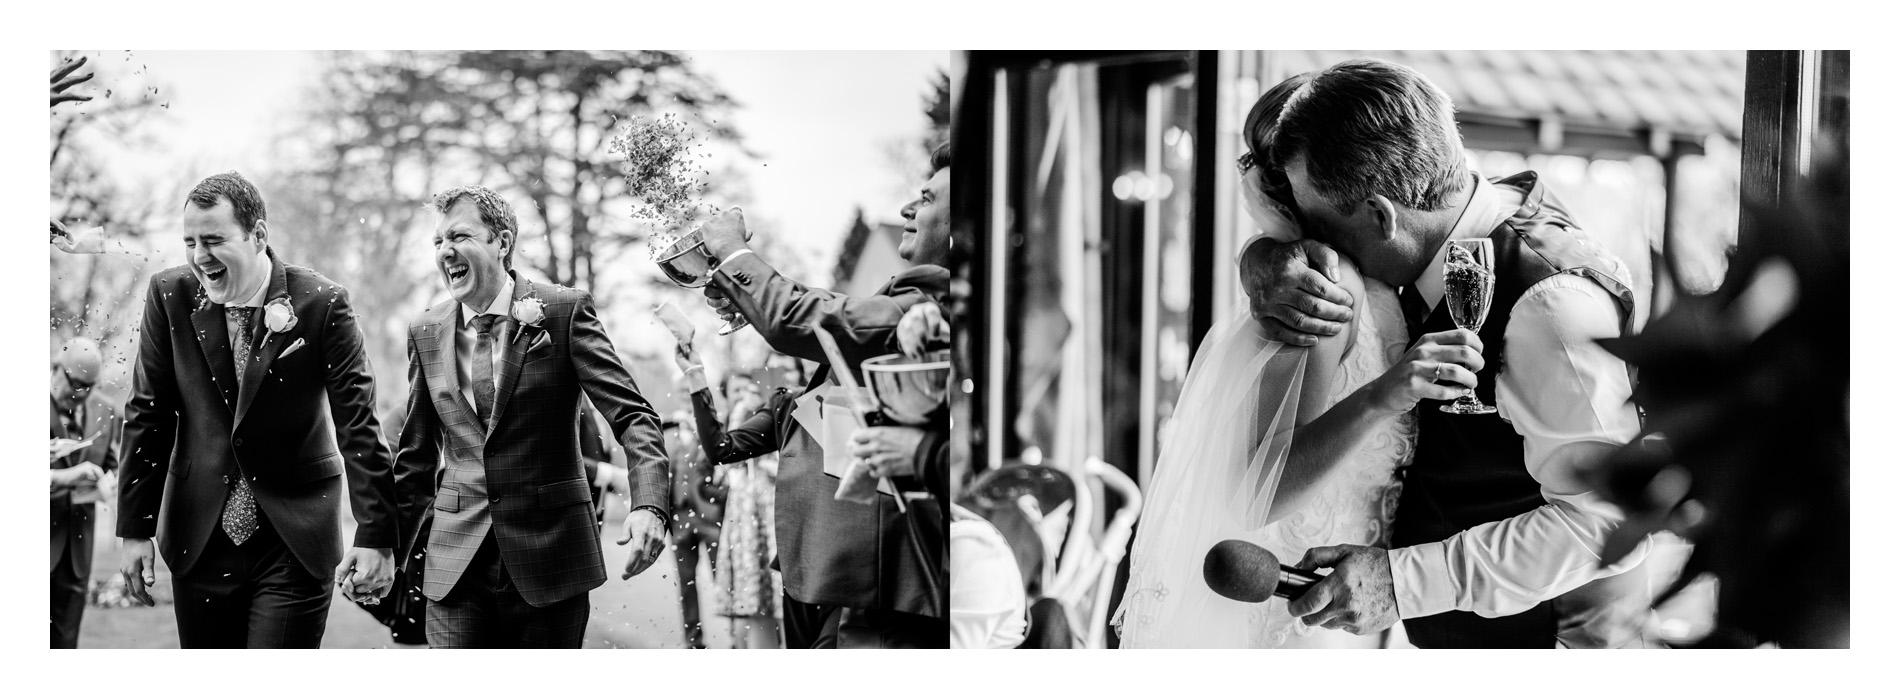 Wedding-Pairs-0003.jpg